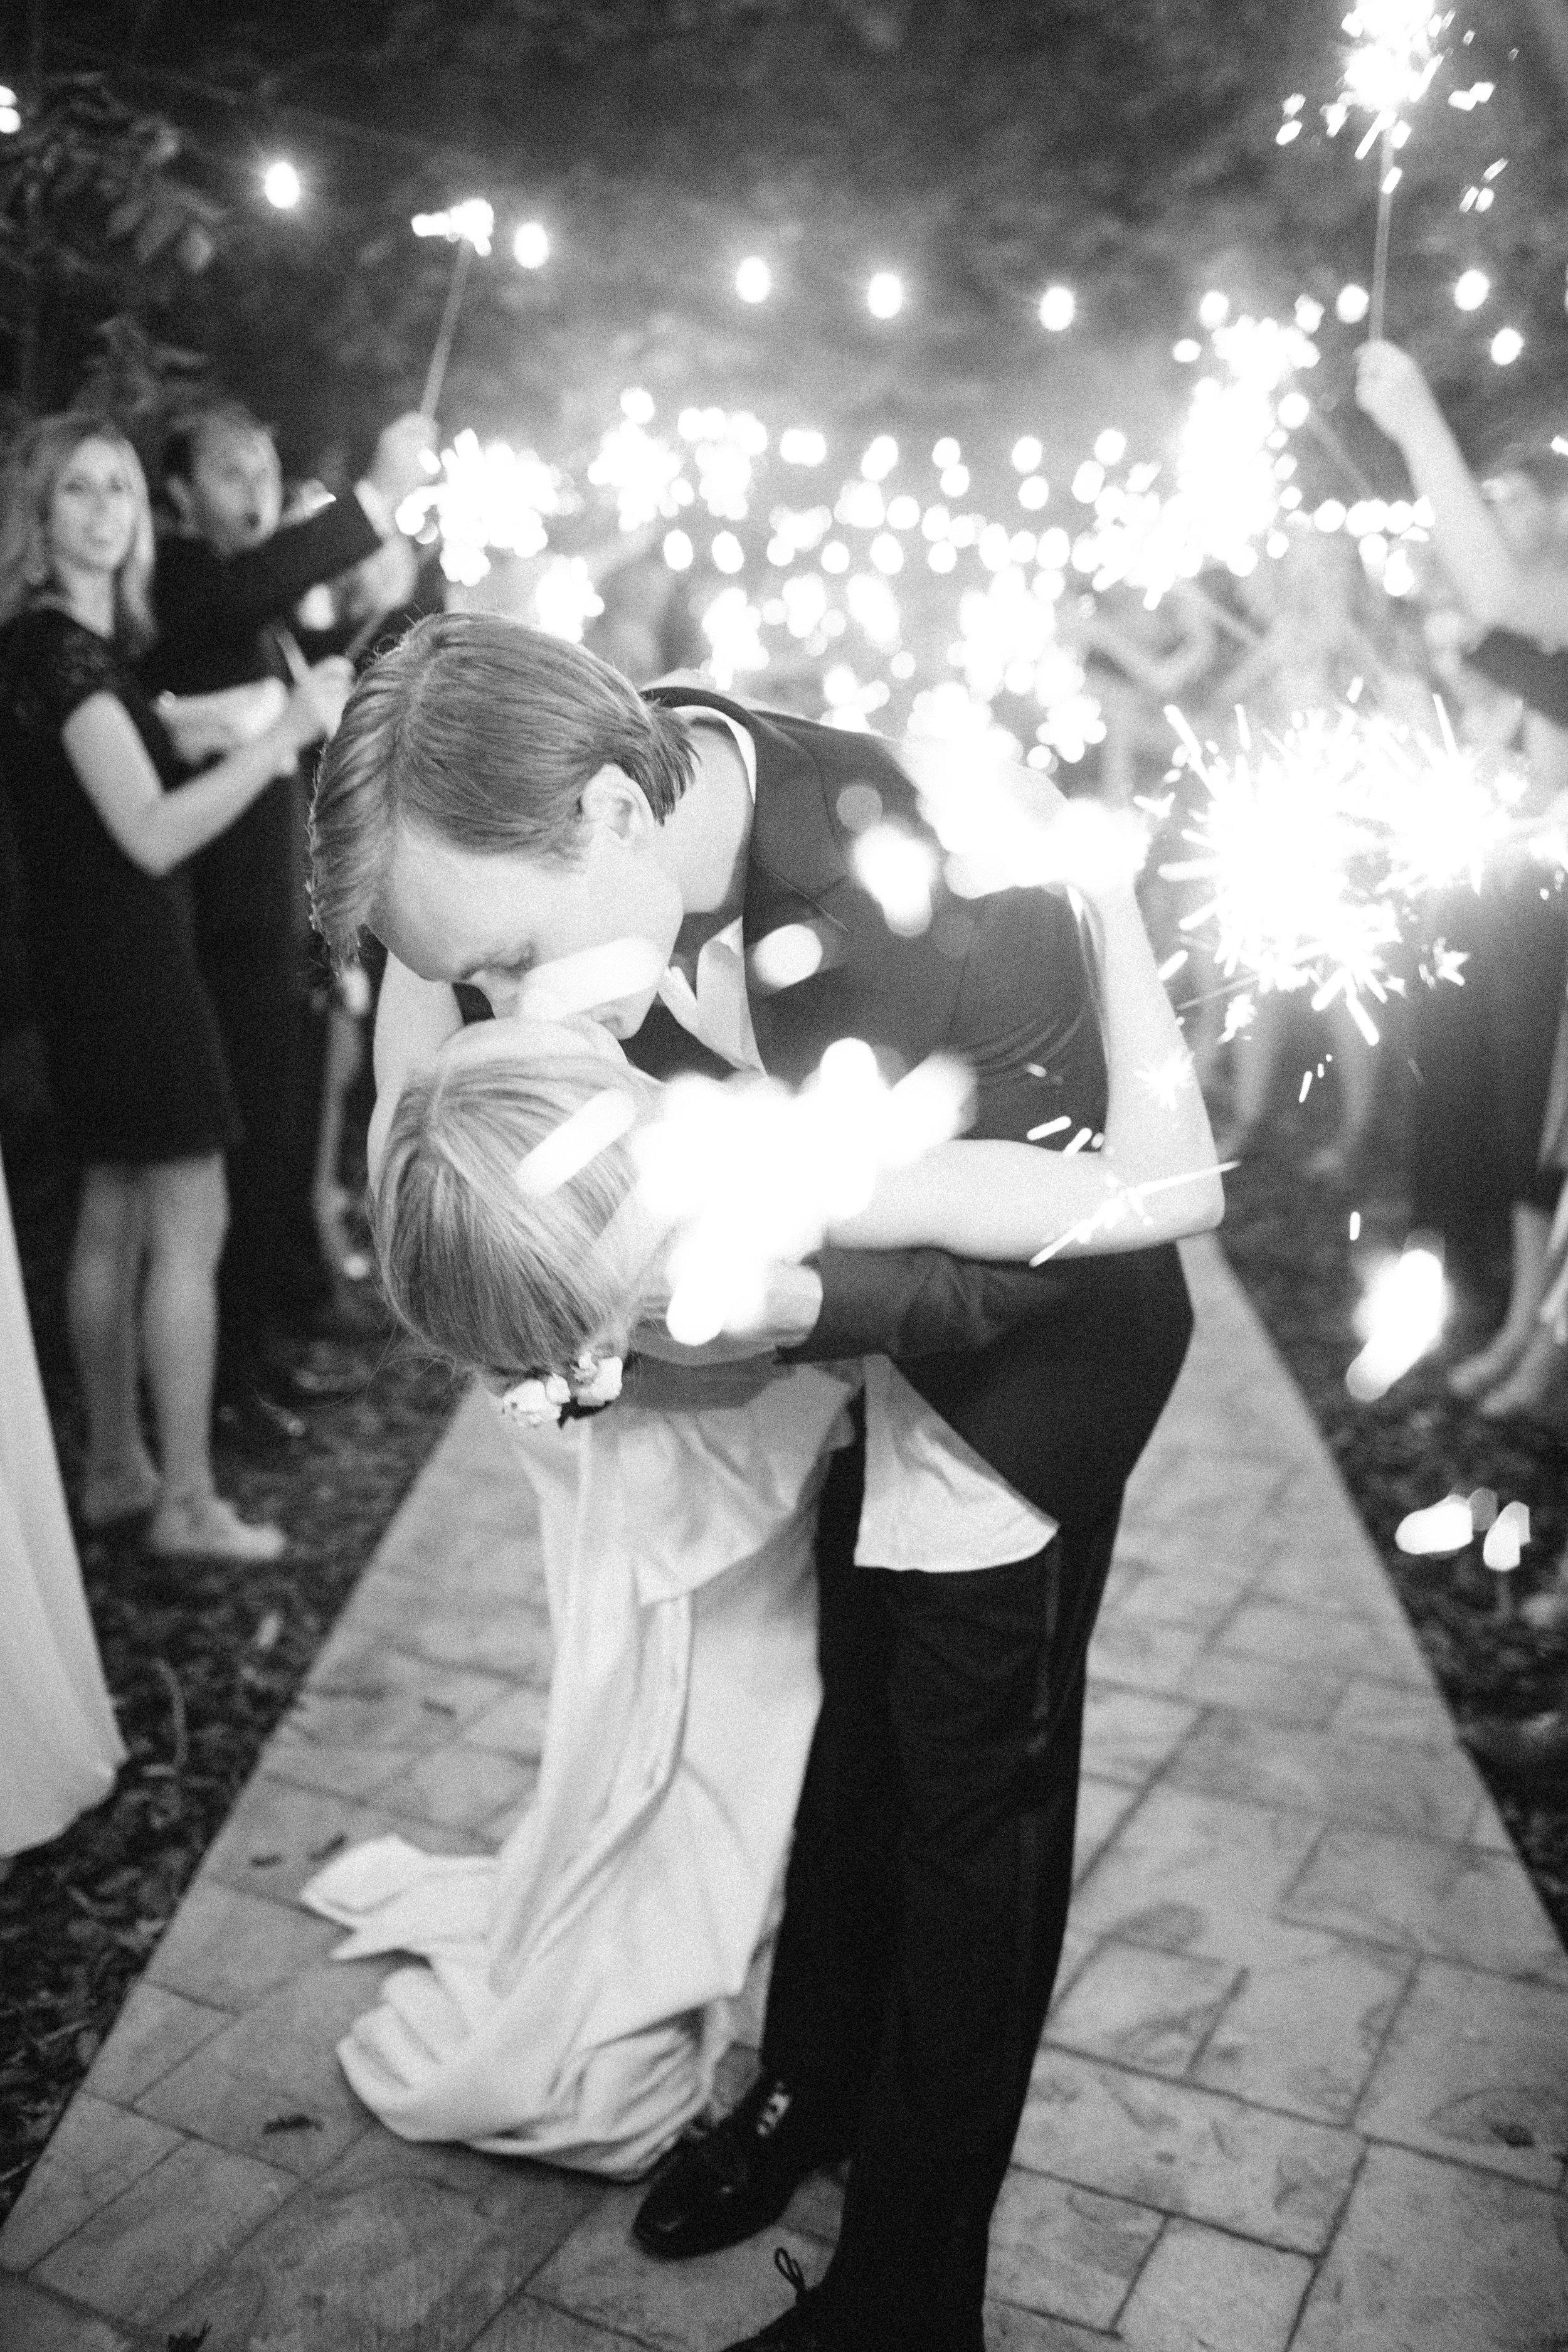 Olivia_Patrick_Wedding_Quarry_Venue_Abigail_Malone_Photography_Knoxville-978.jpg